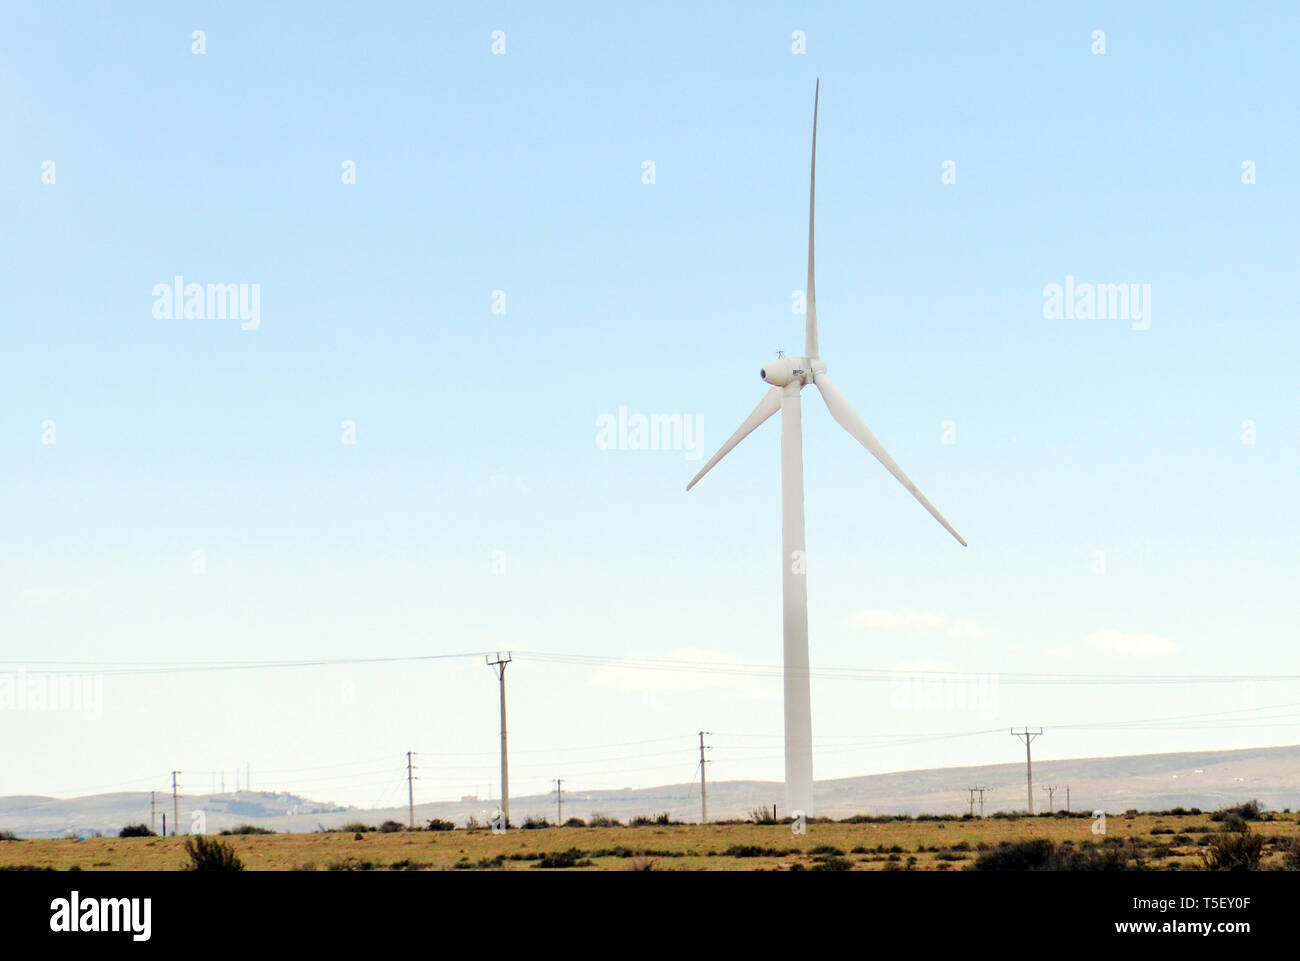 A Wind Turbine at a renewable Energy farm in Jordan. - Stock Image